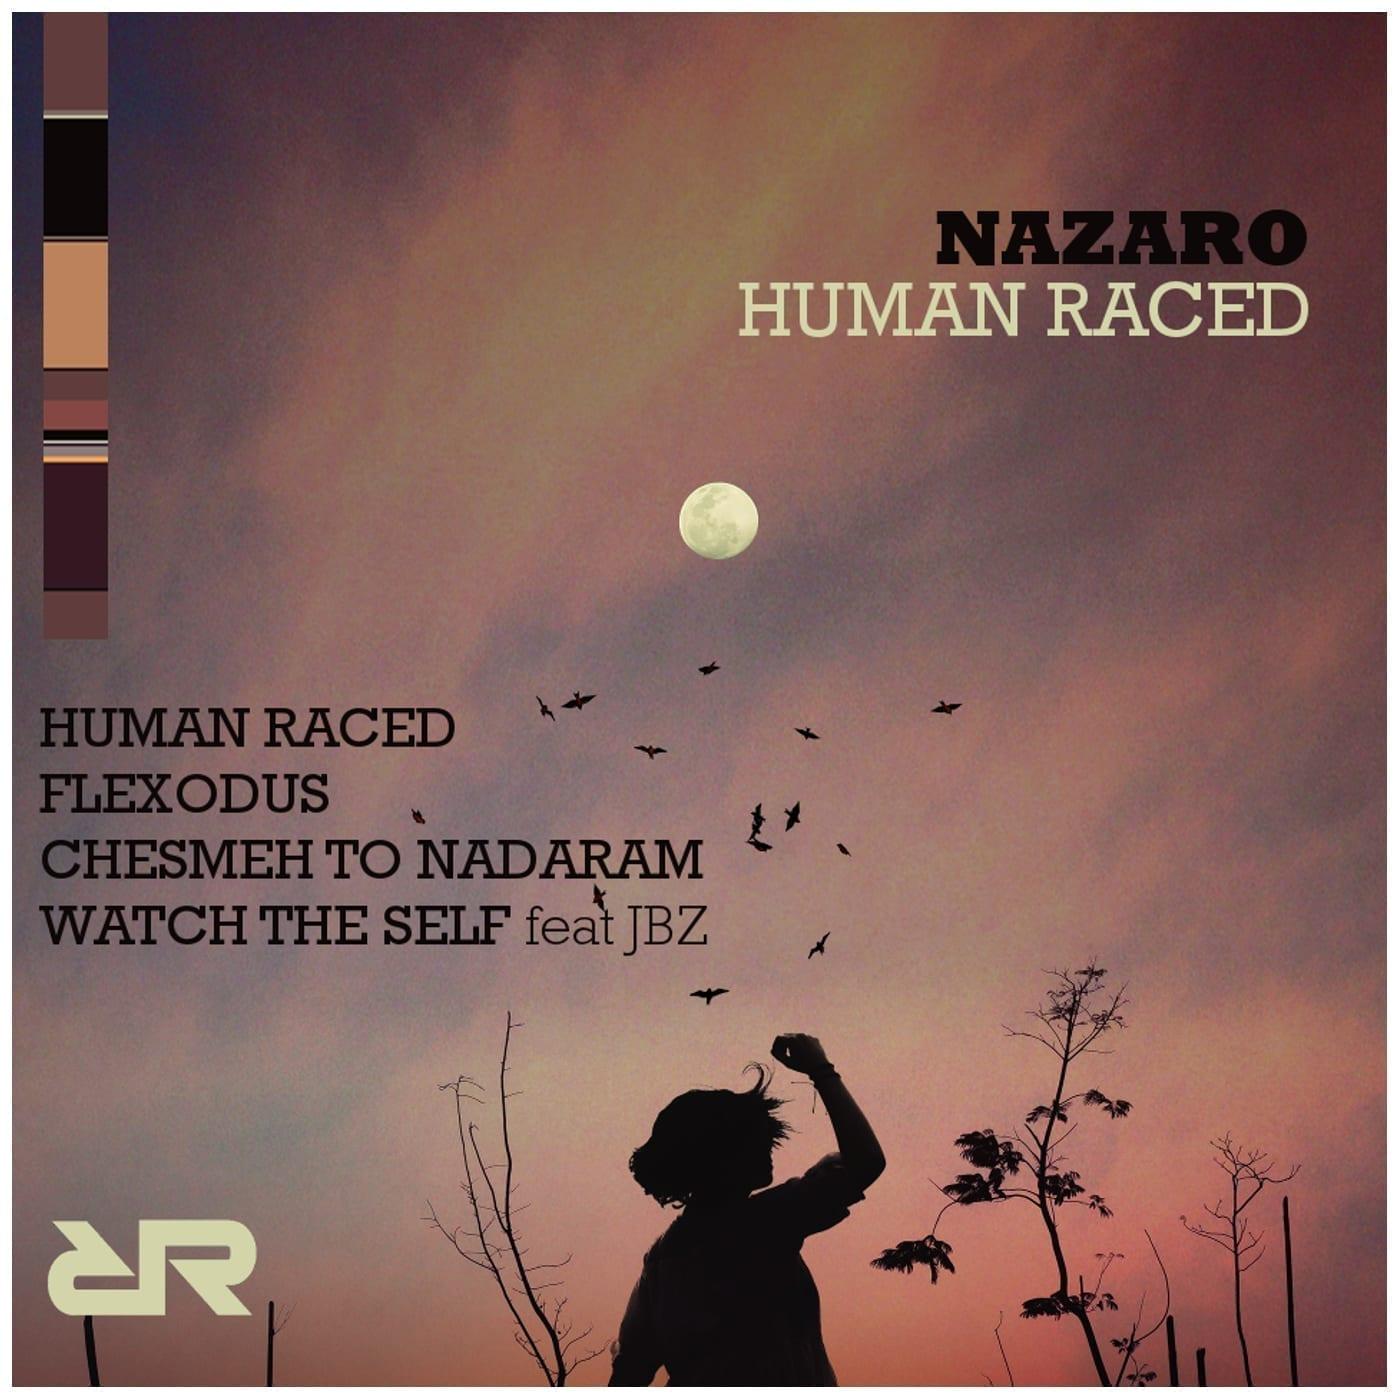 Nazaro Human raced